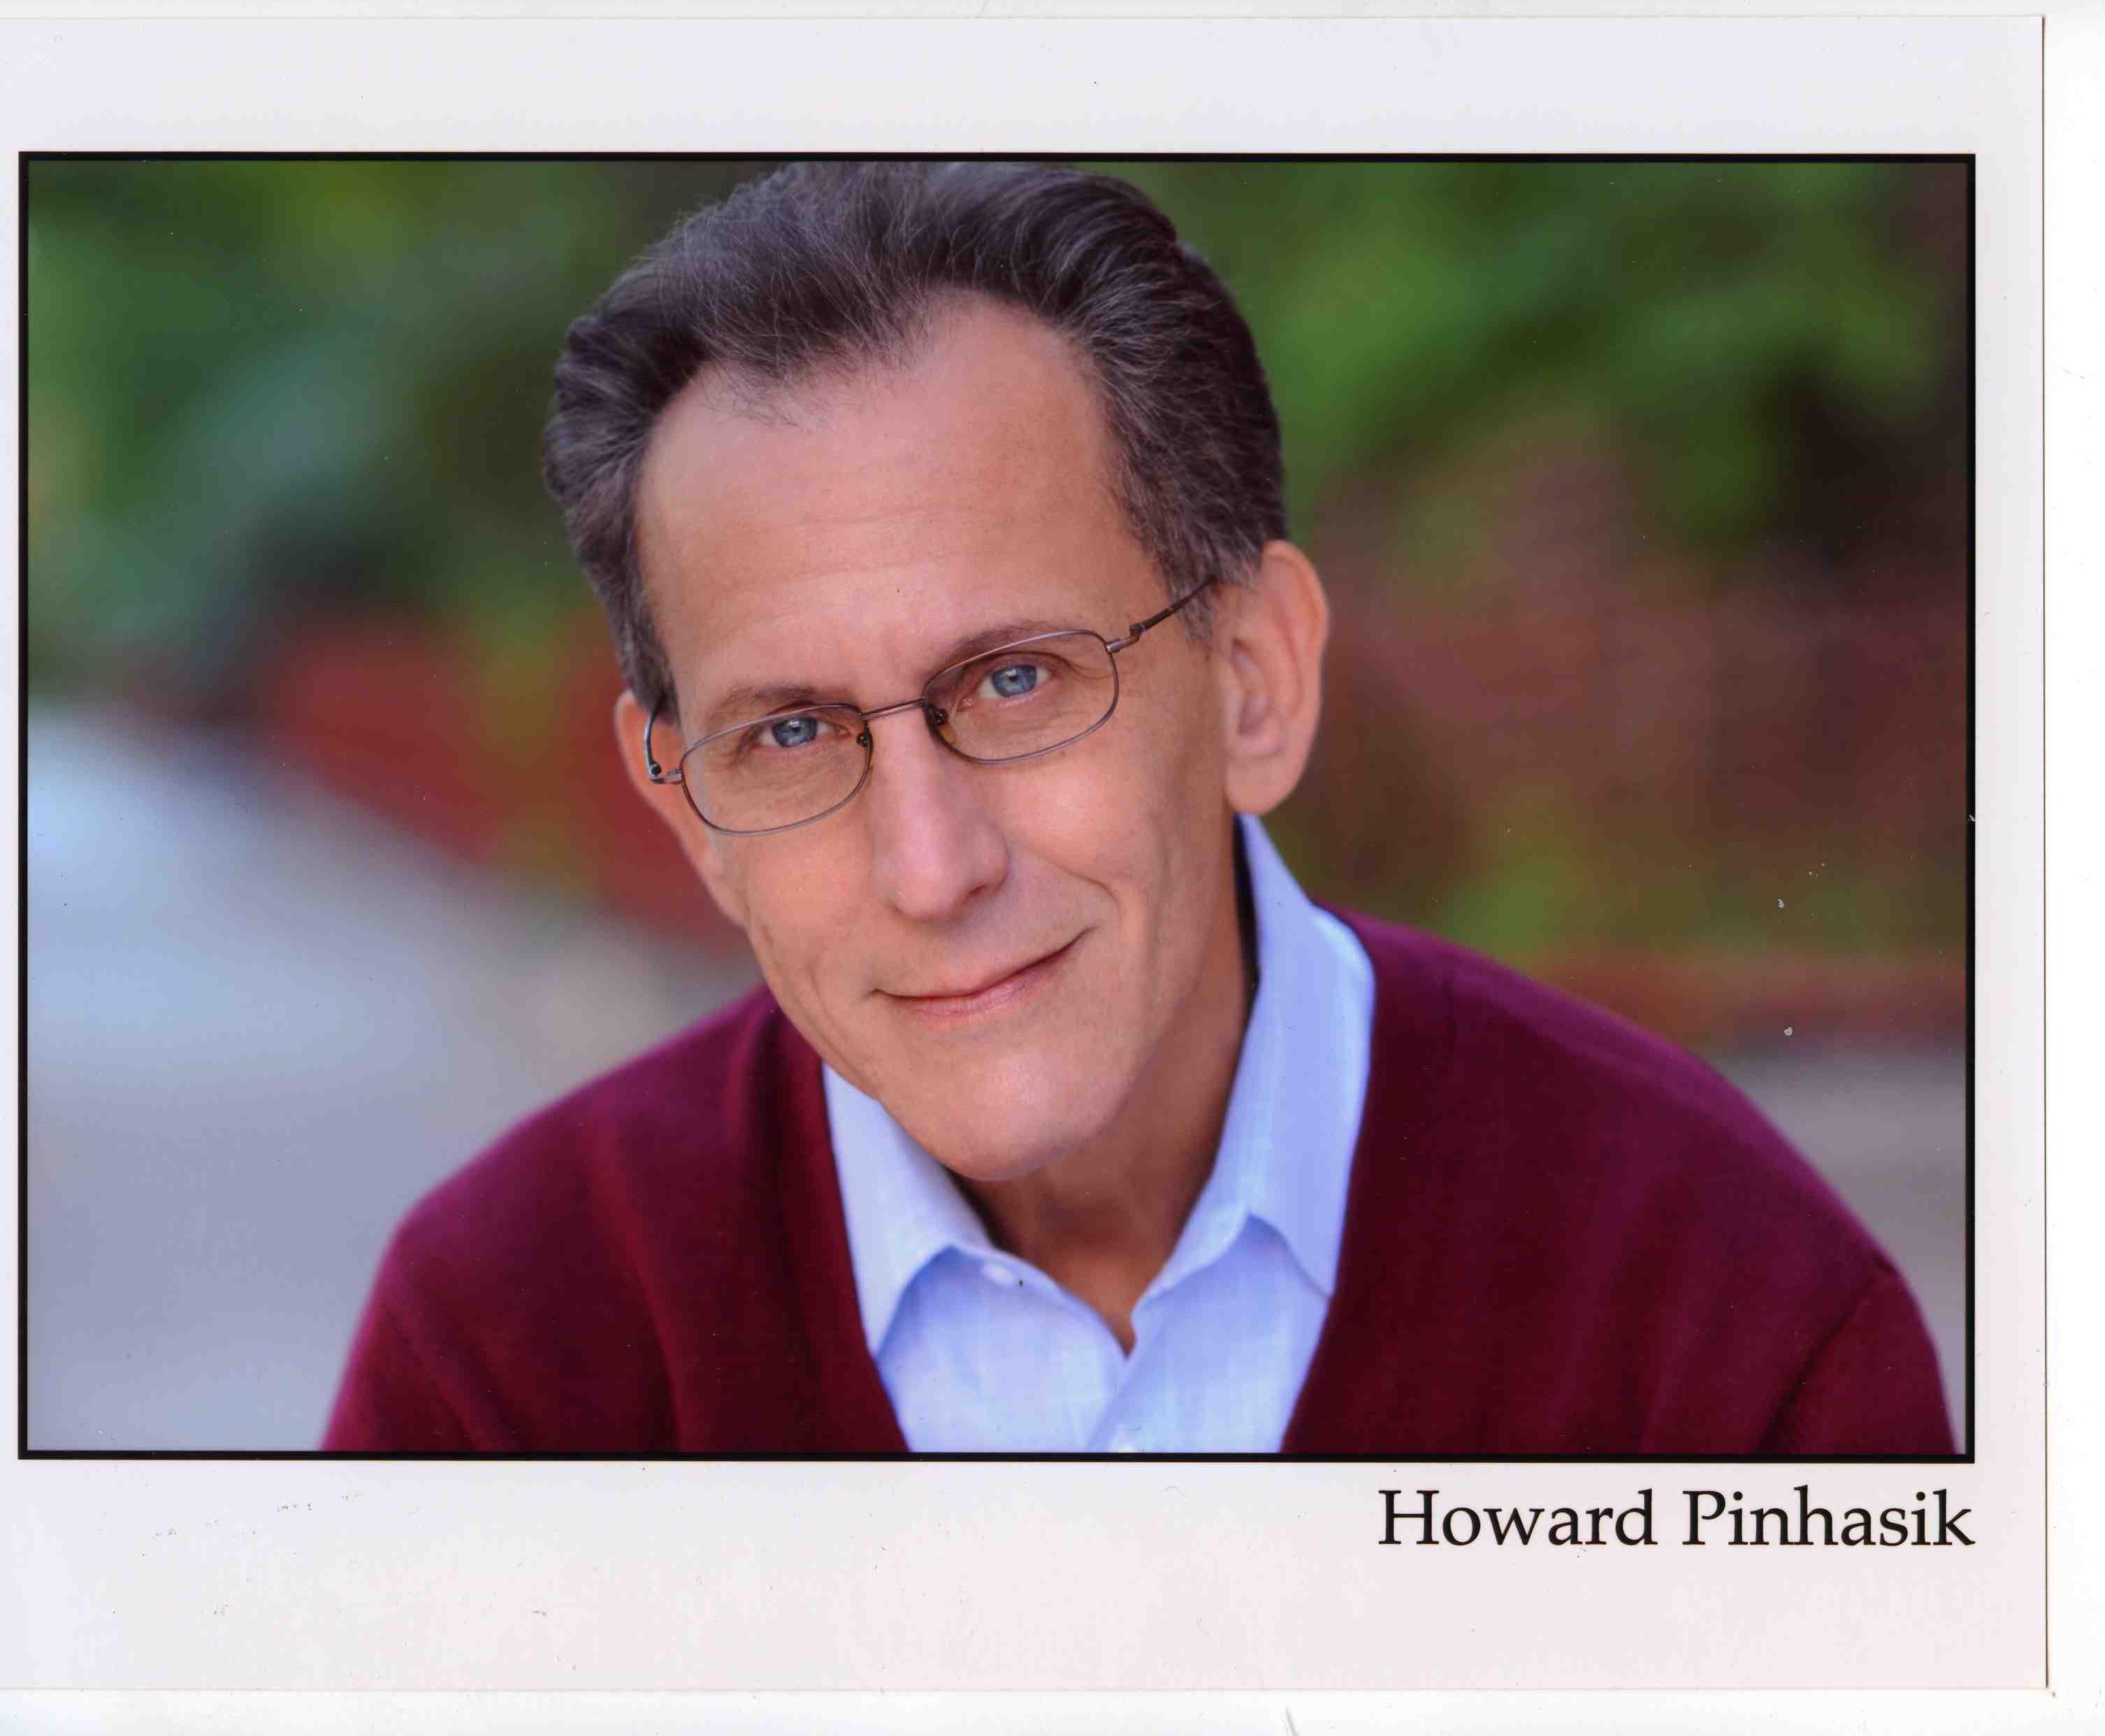 Howard Pinhasik's primary photo